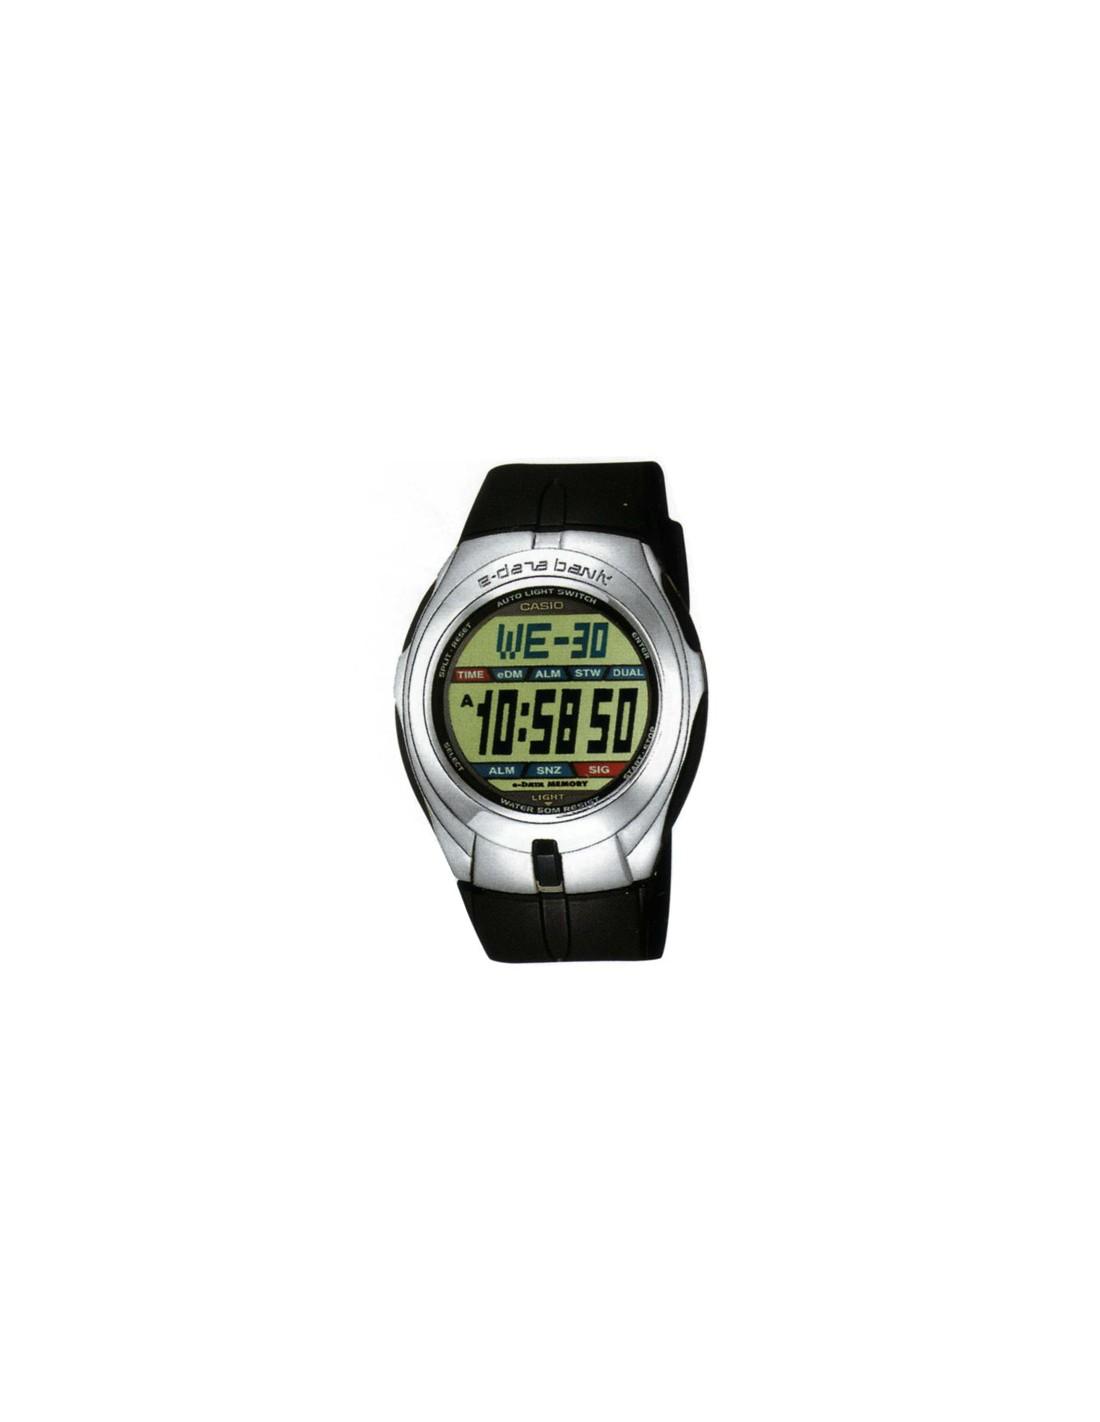 b6fbb294eabd Reloj Casio Data Bank DB-70-1VER. Lista de deseos